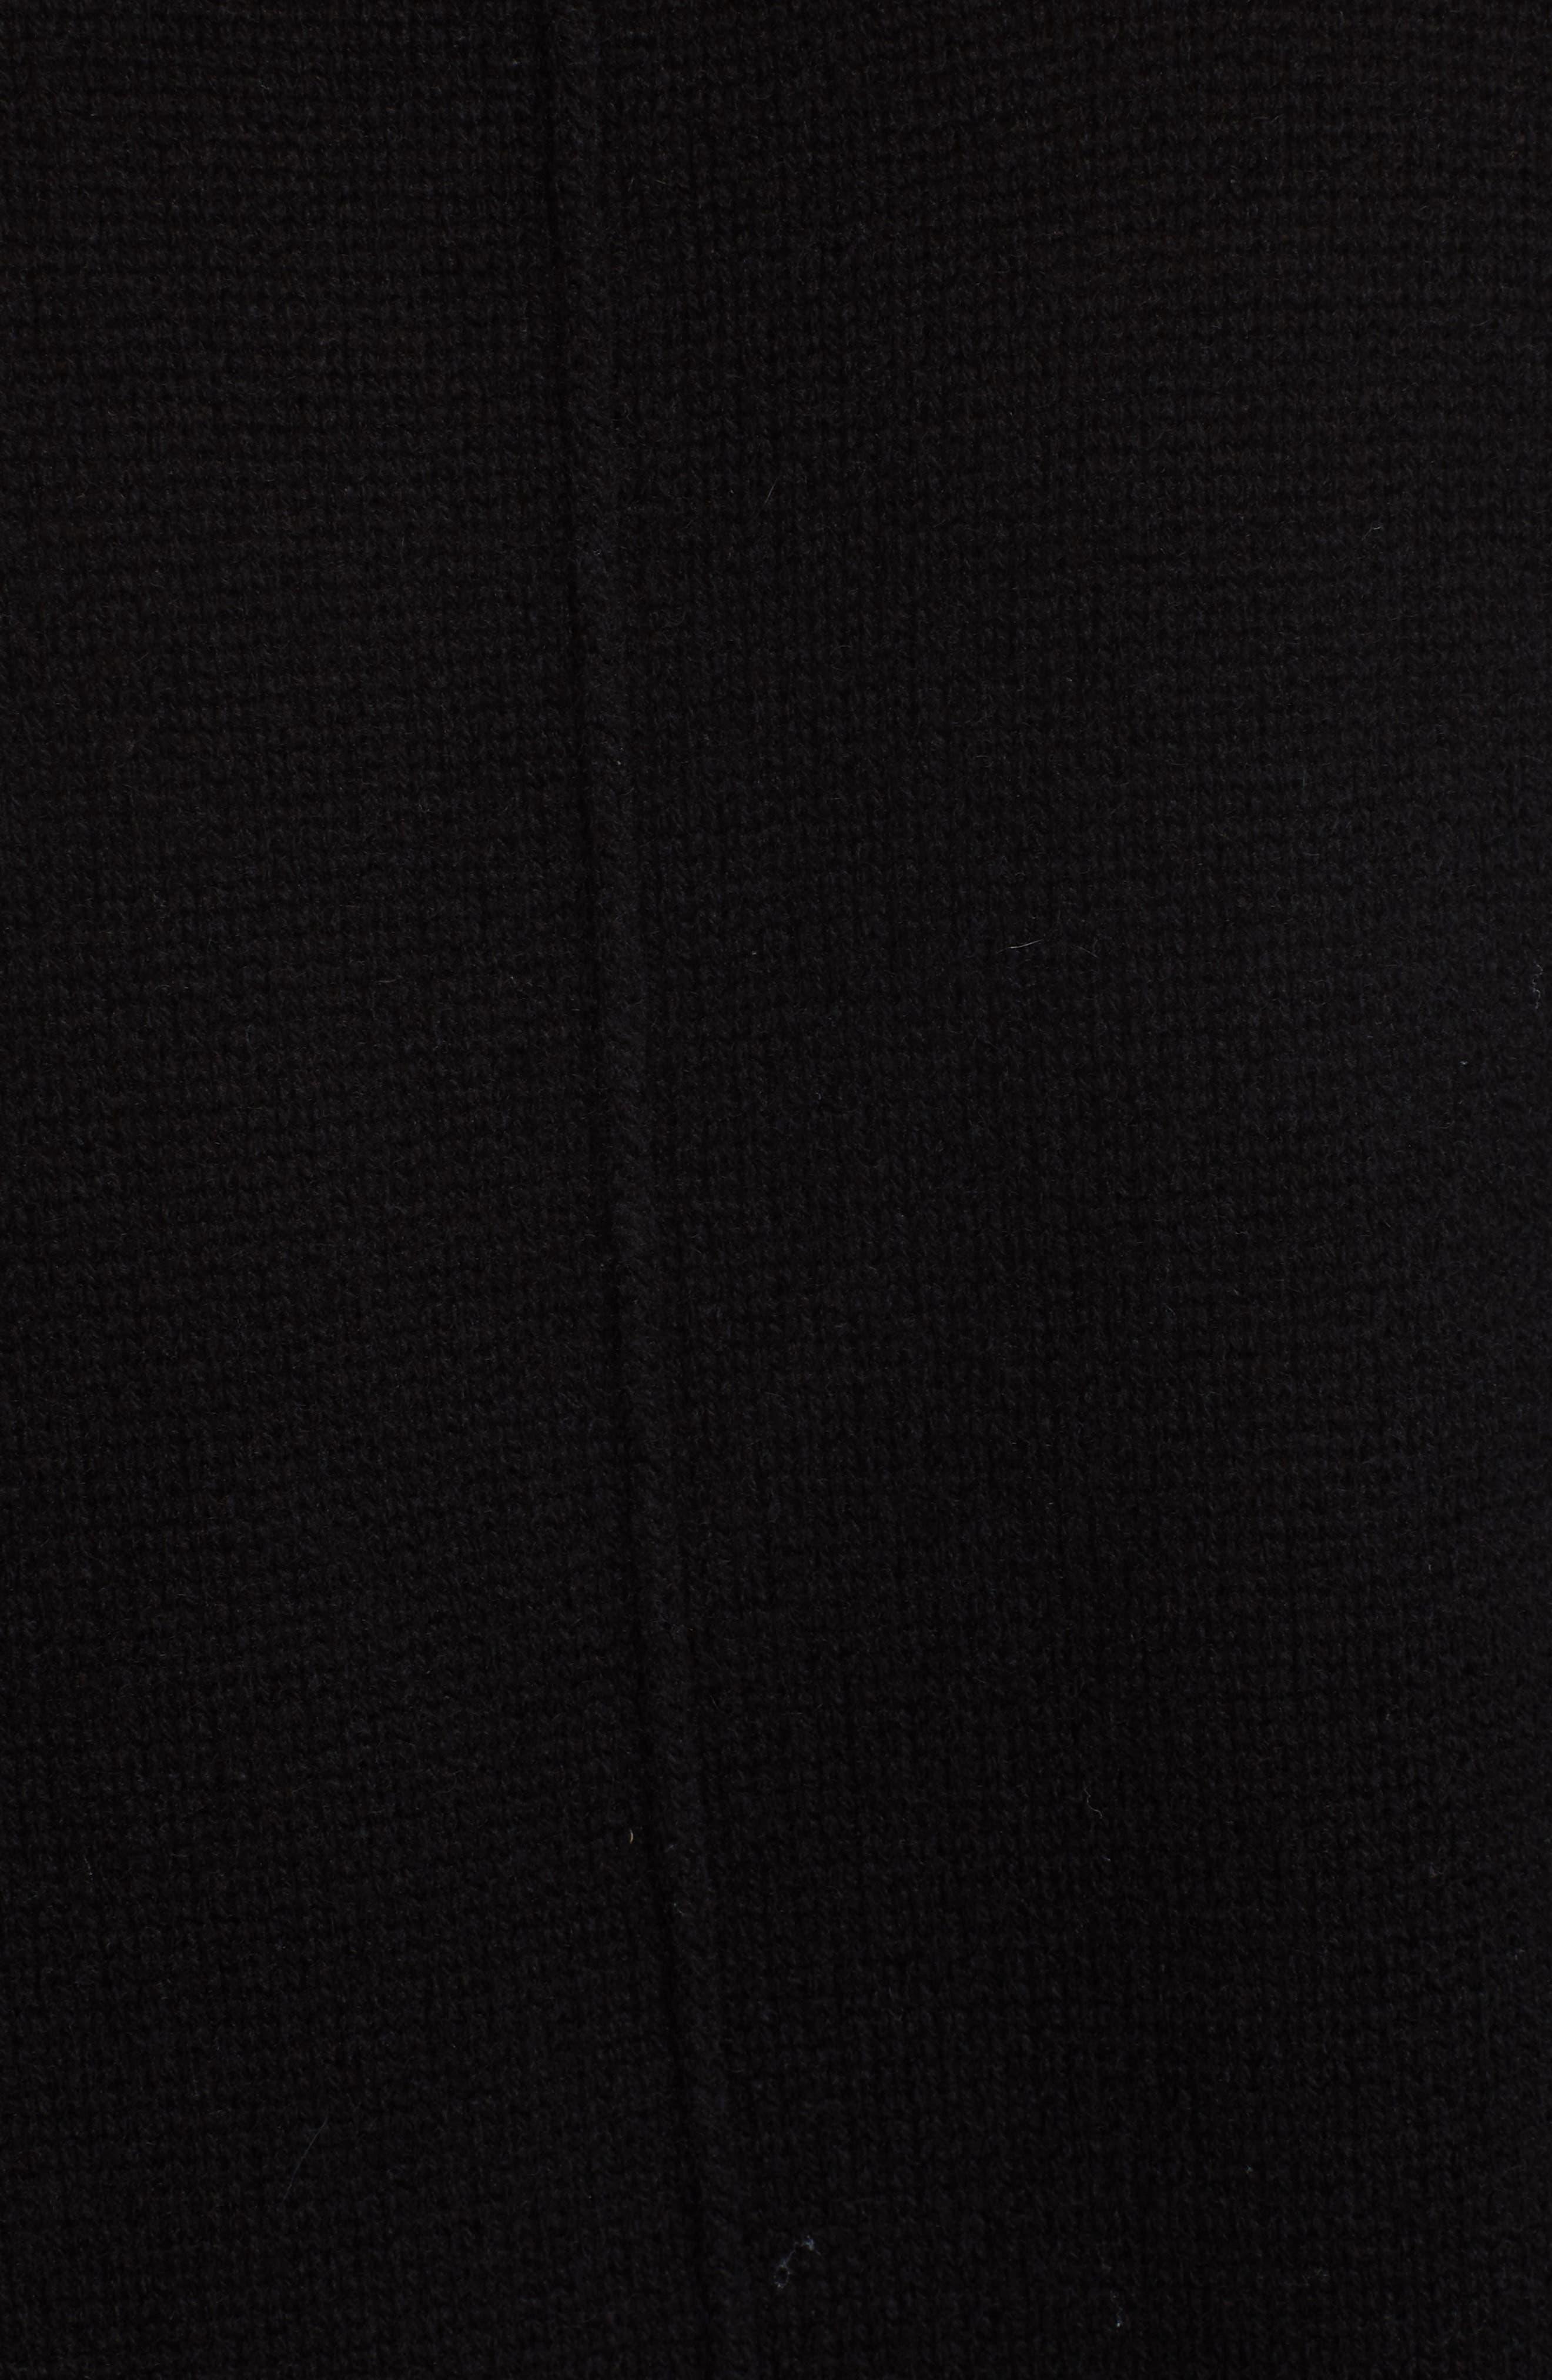 V-Neck Layered Pullover,                             Alternate thumbnail 5, color,                             BLACK ONYX